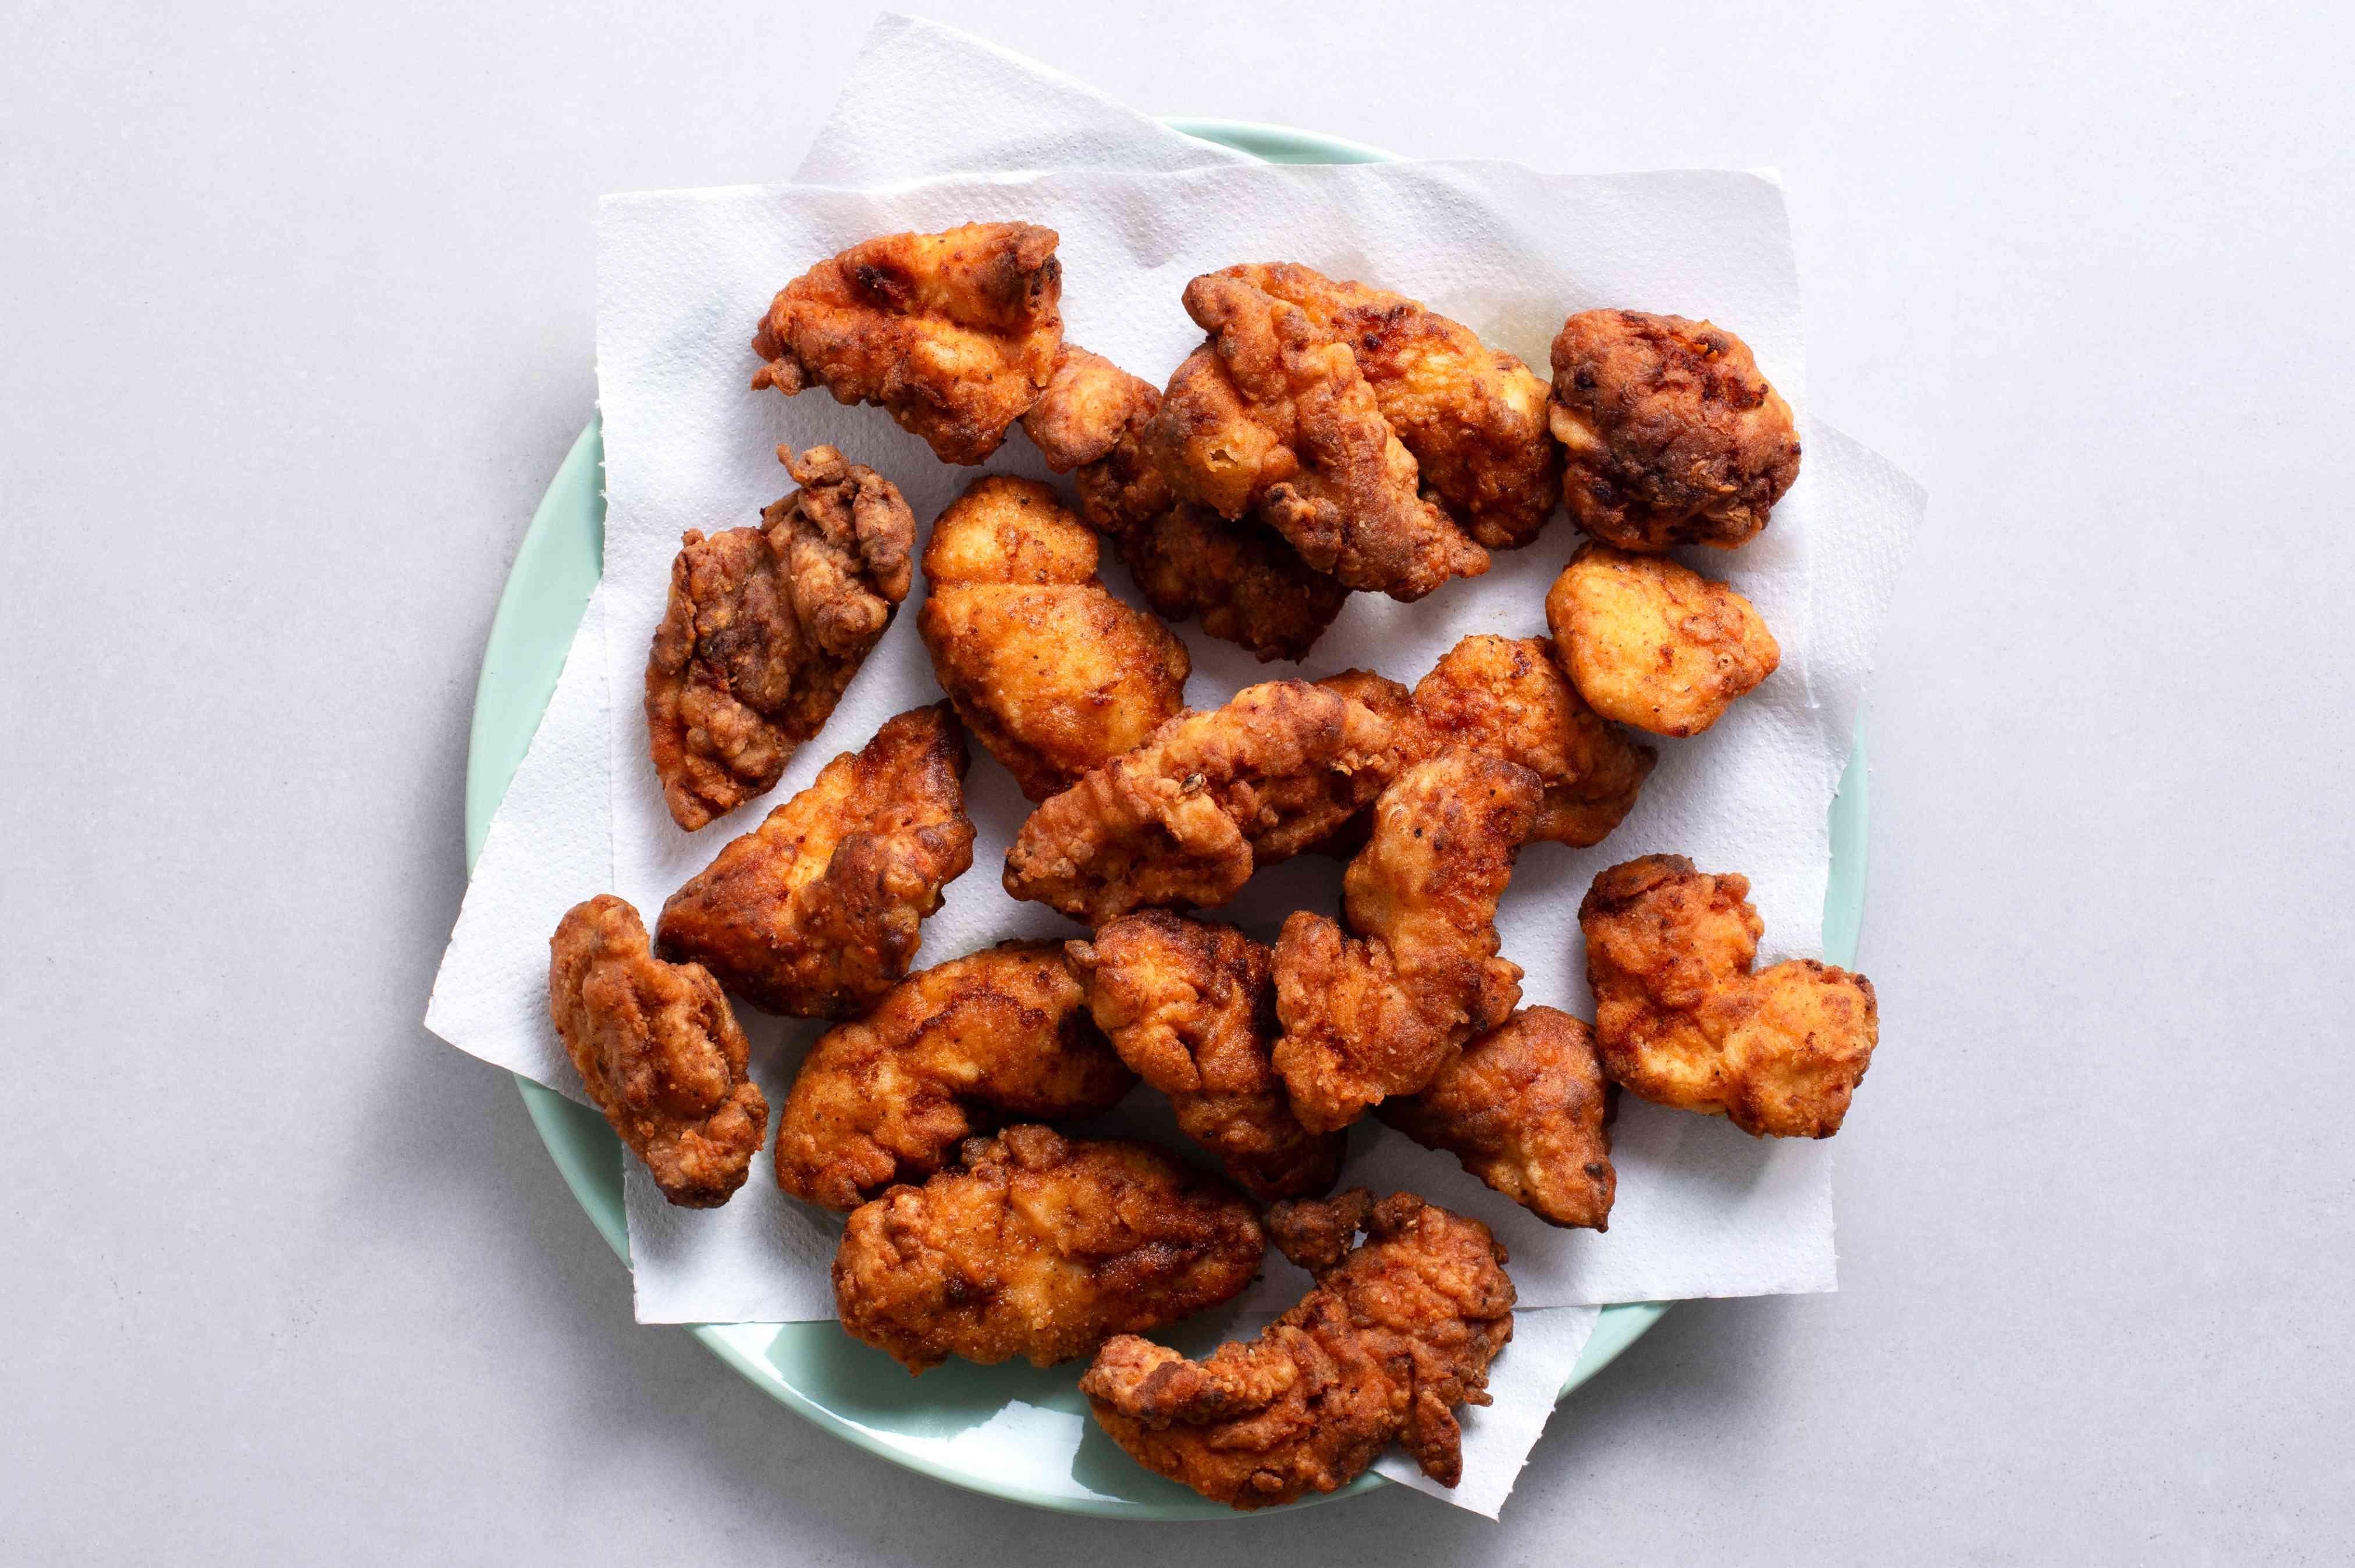 Dominican Fried Chicken (Chicharrones de Pollo)